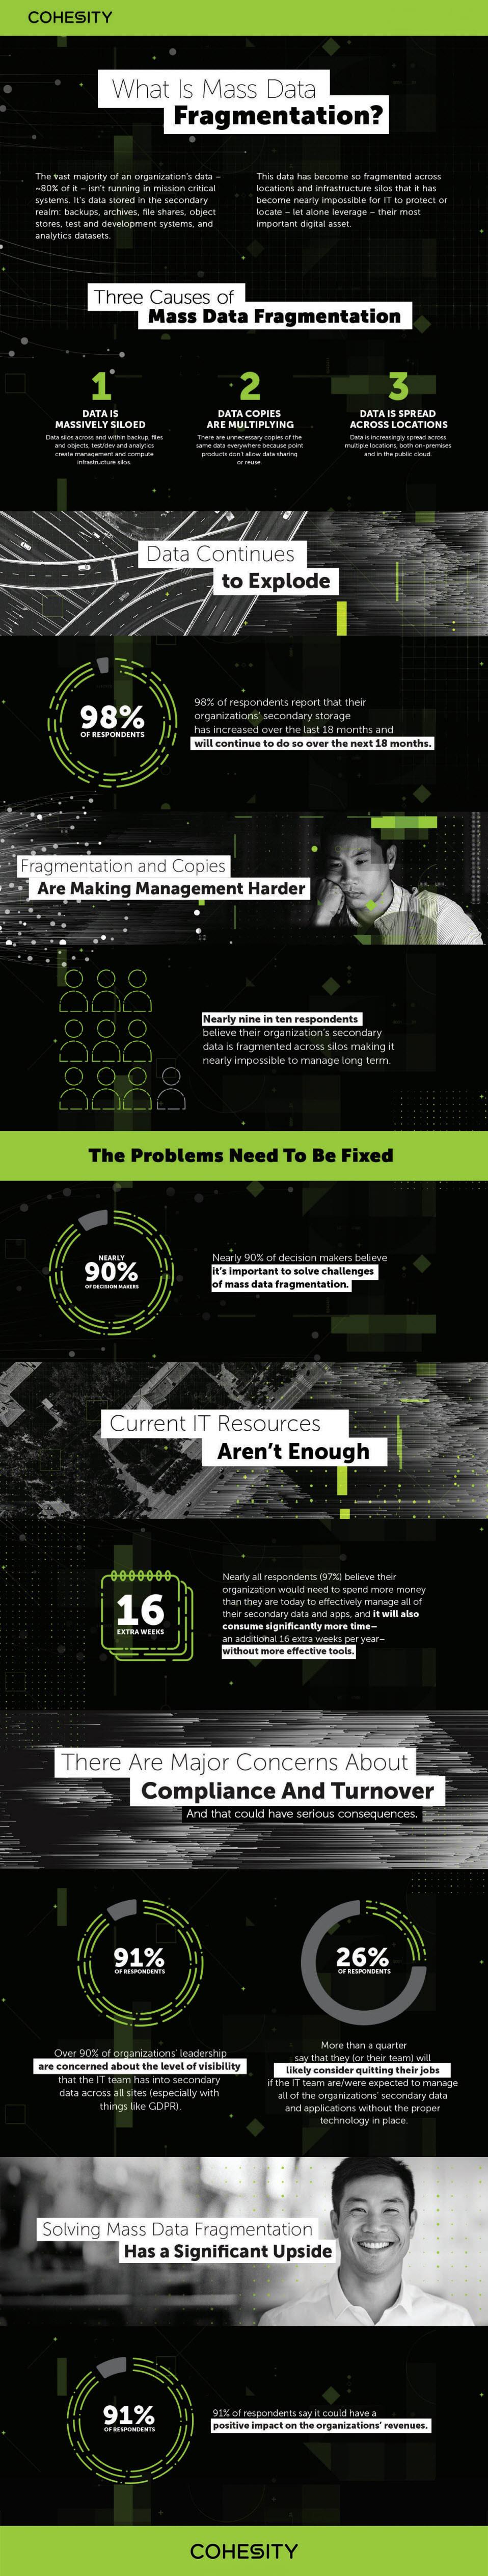 Cohesity - What is mass data fragmentation